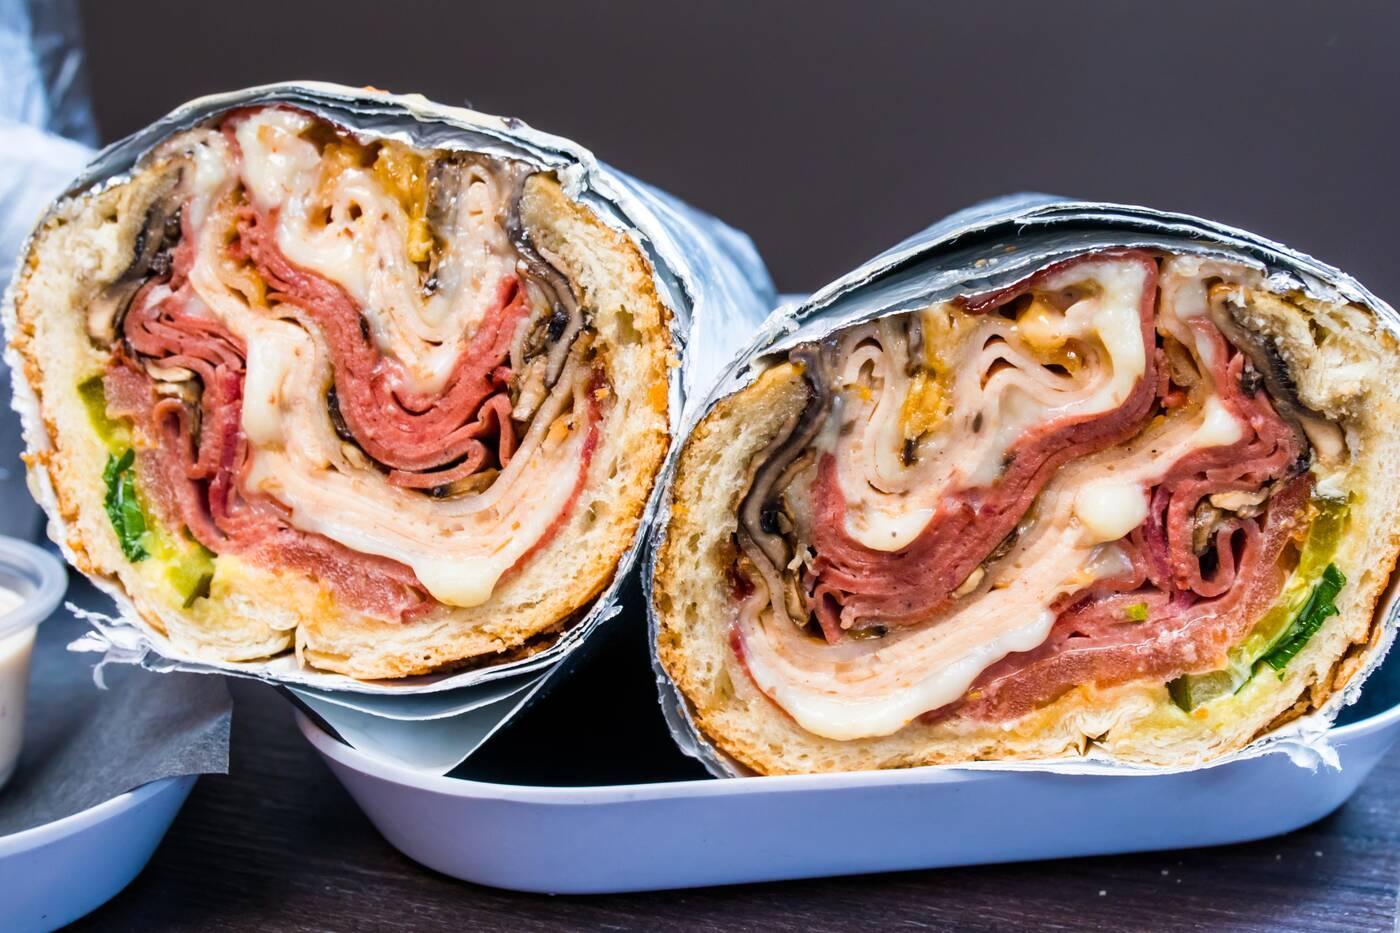 Topol sandwich